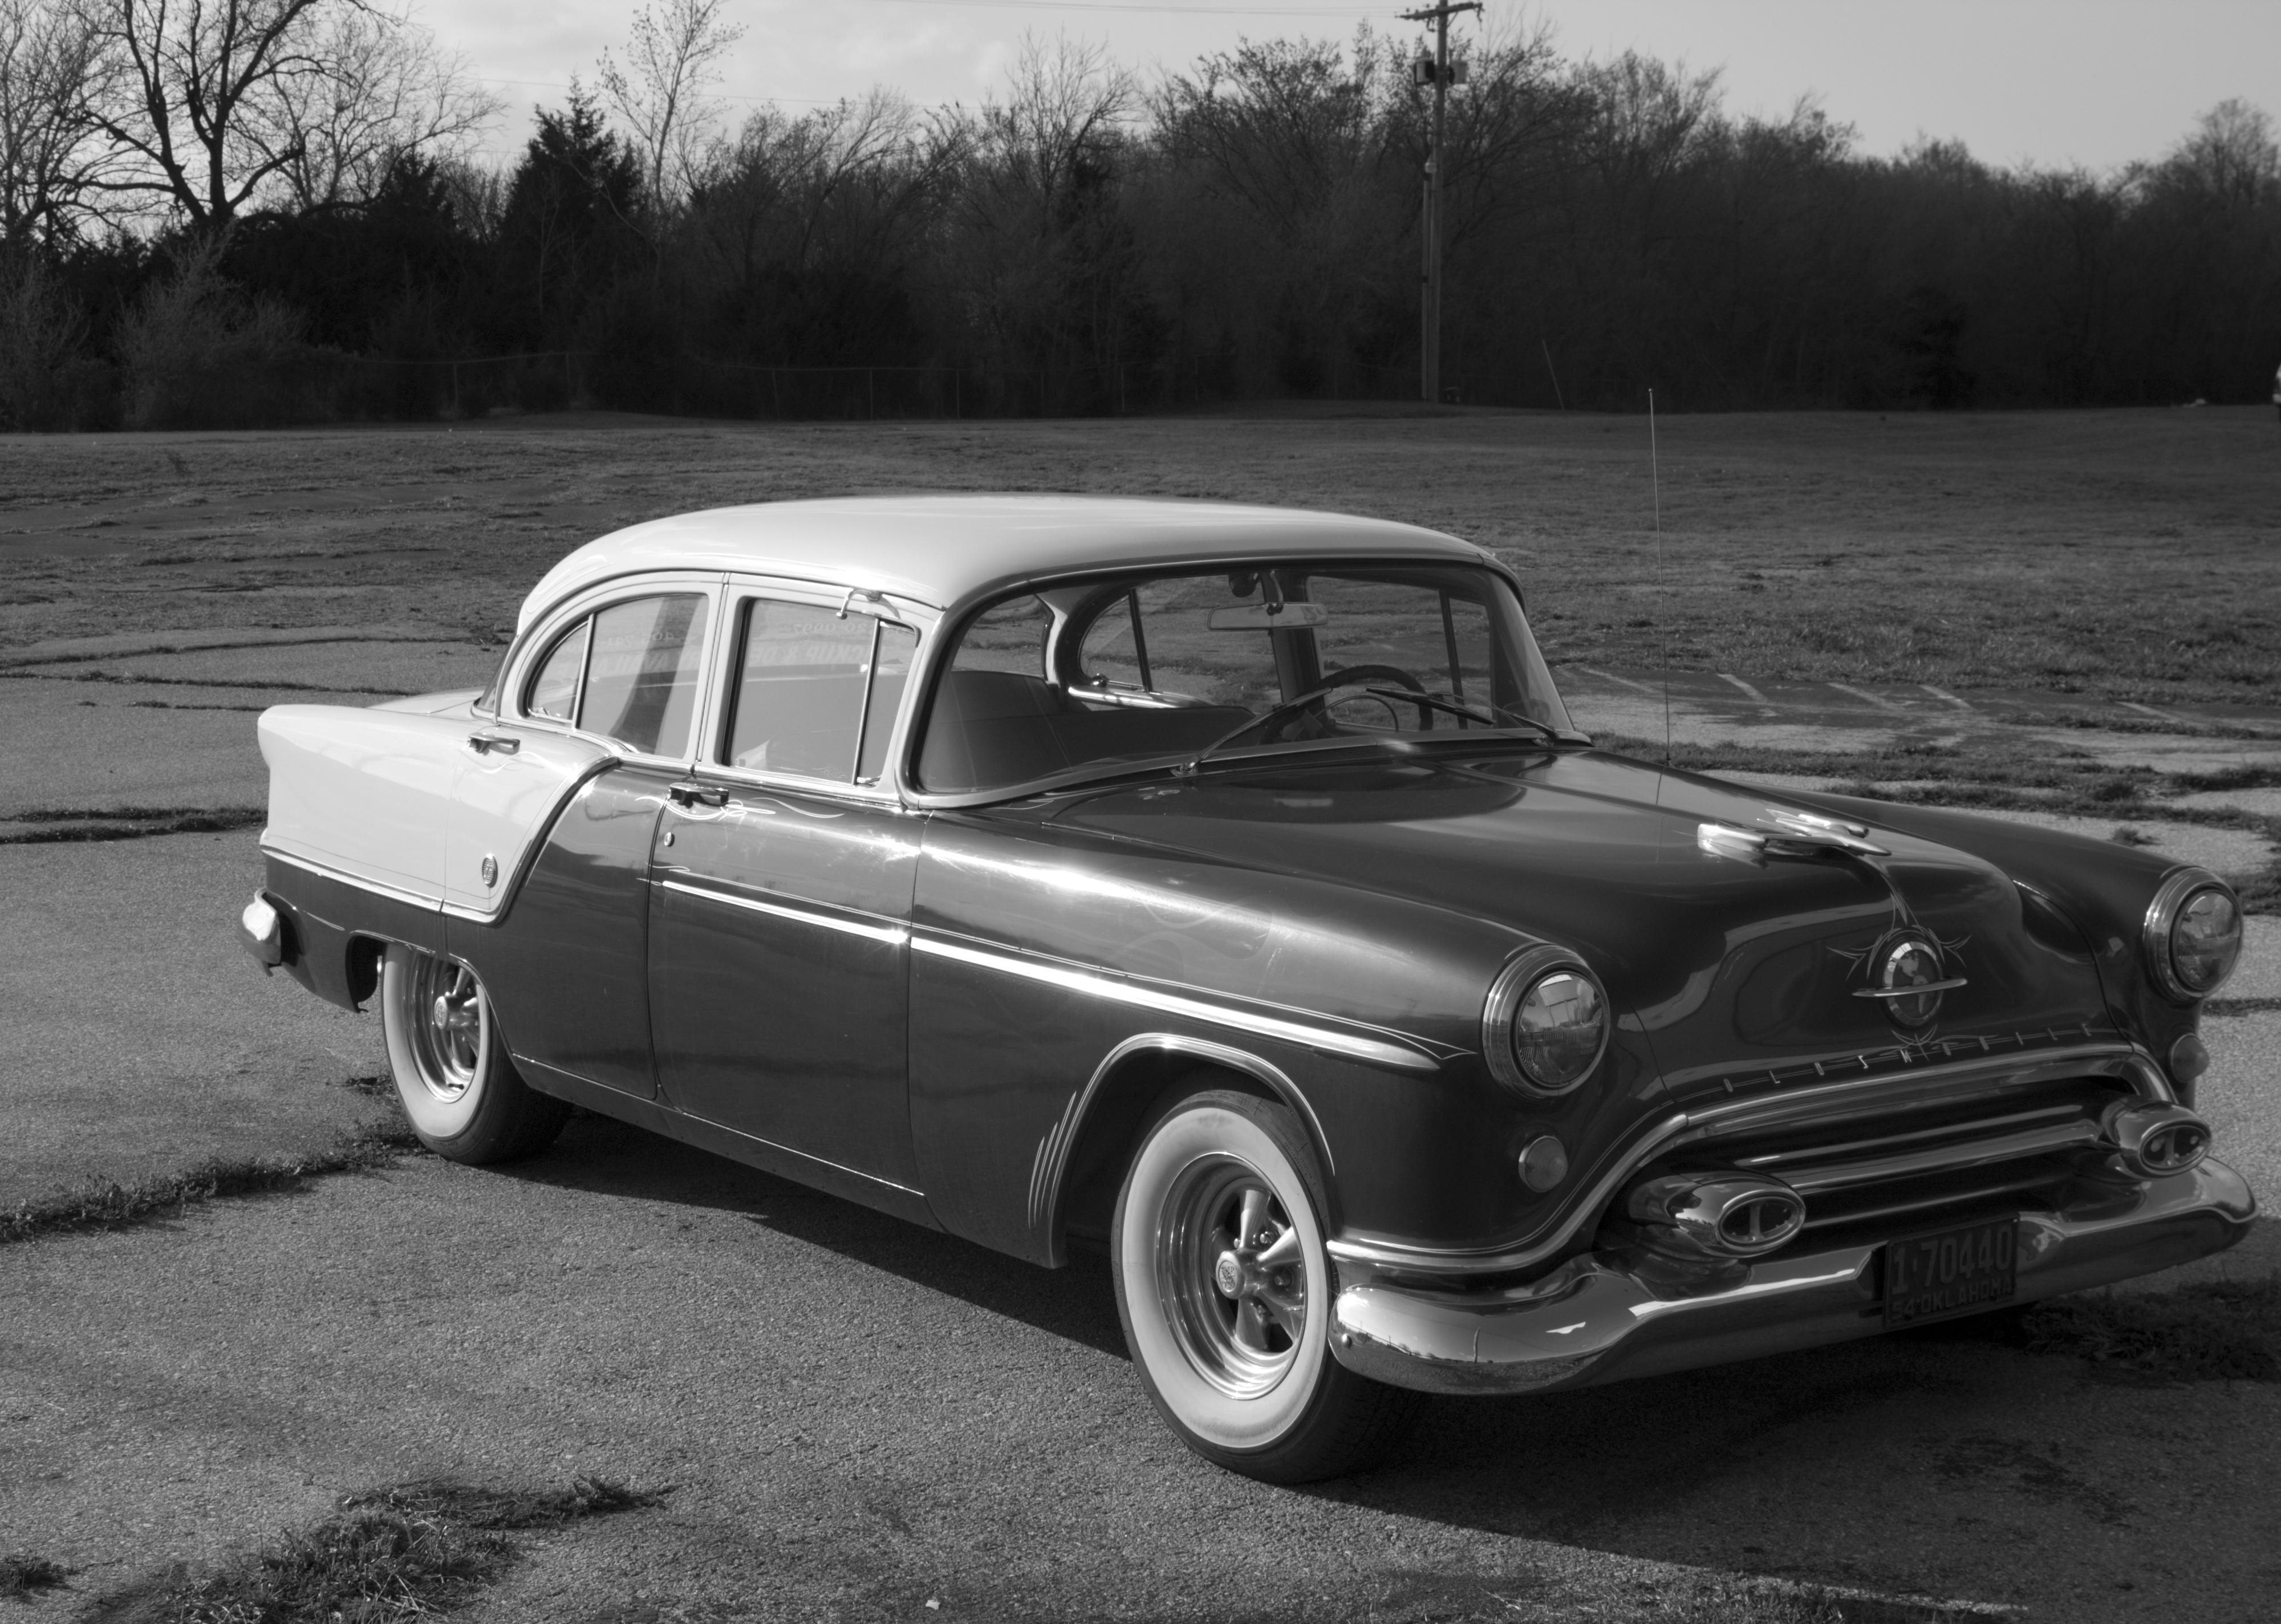 Free Images : classic car, motor vehicle, vintage car, sedan, old ...